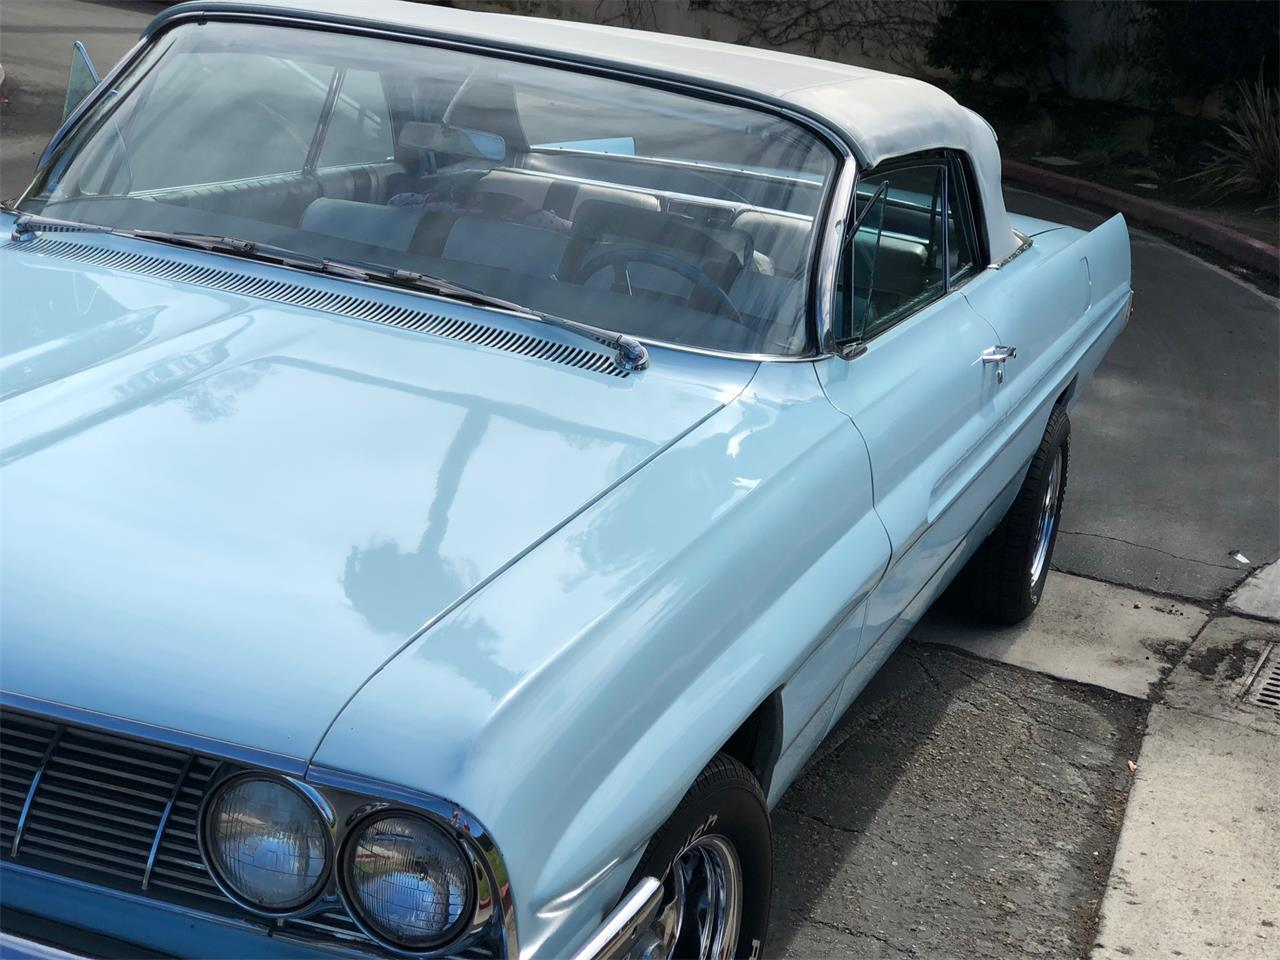 Large Picture of 1961 Pontiac Bonneville located in Cot de Caza California - ASQZ